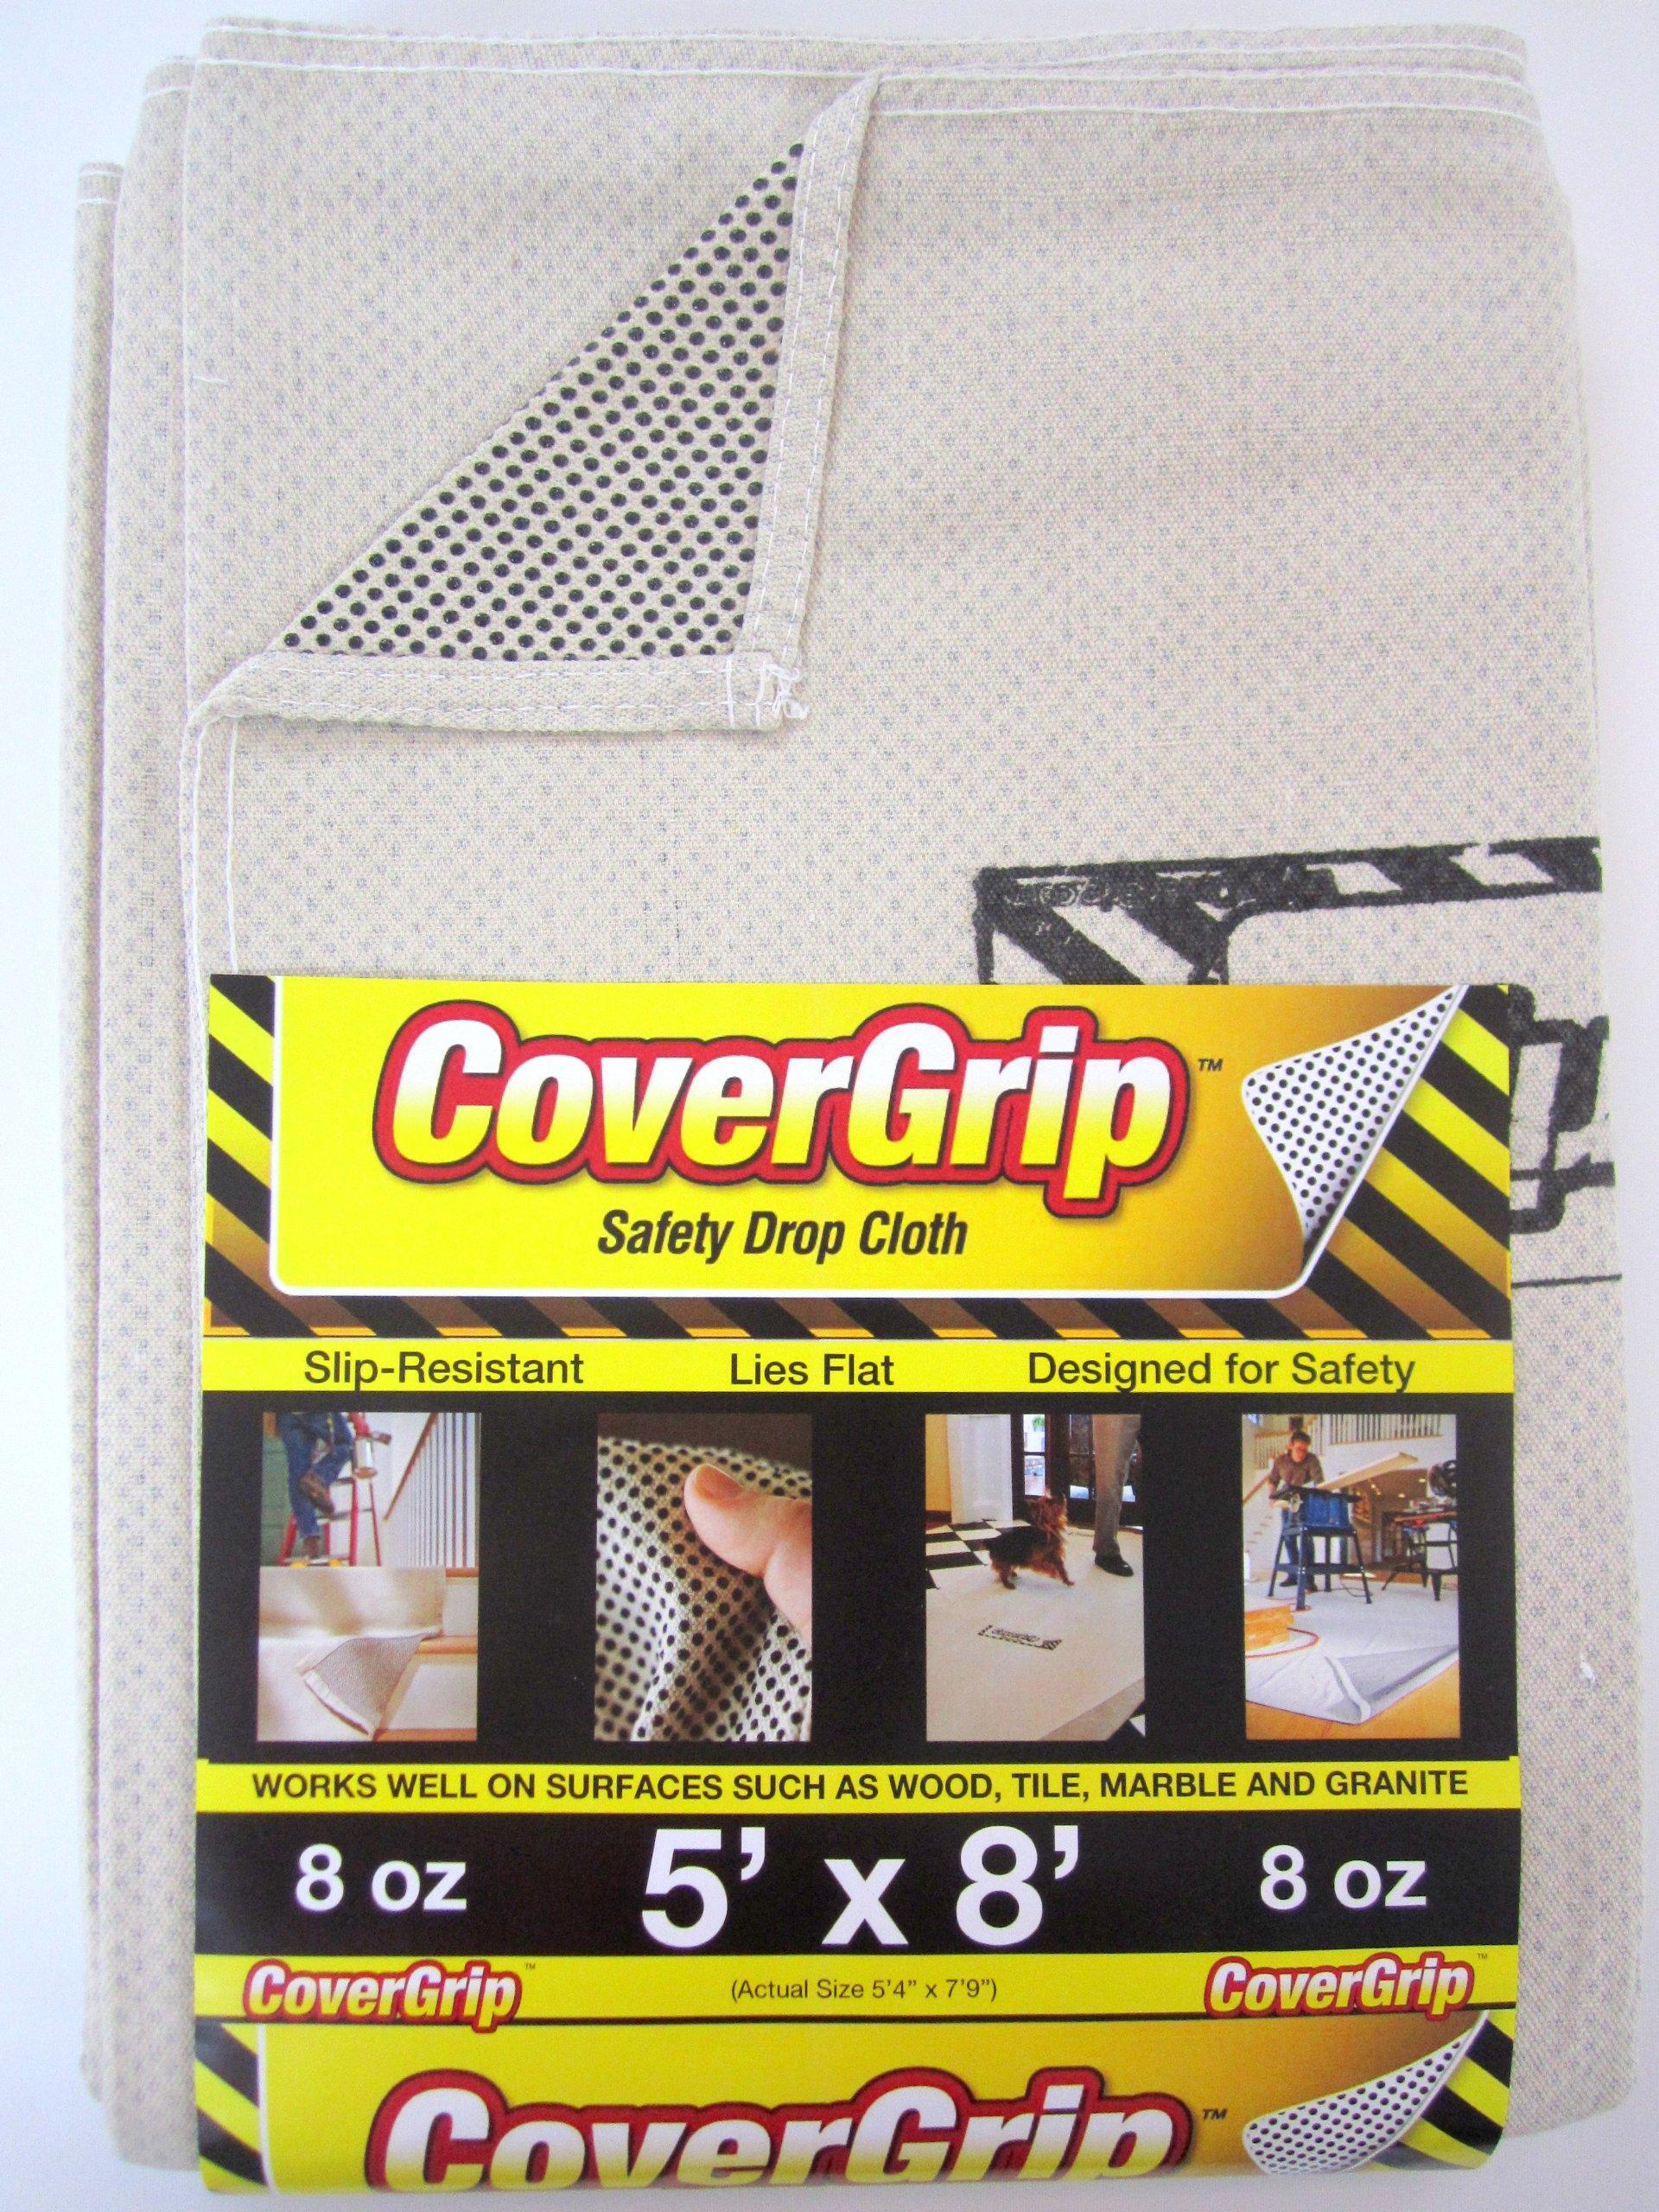 CoverGrip 005808 8oz 5'x8' 8 oz Canvas Safety Drop Cloth, 5' x 8', Off Off White